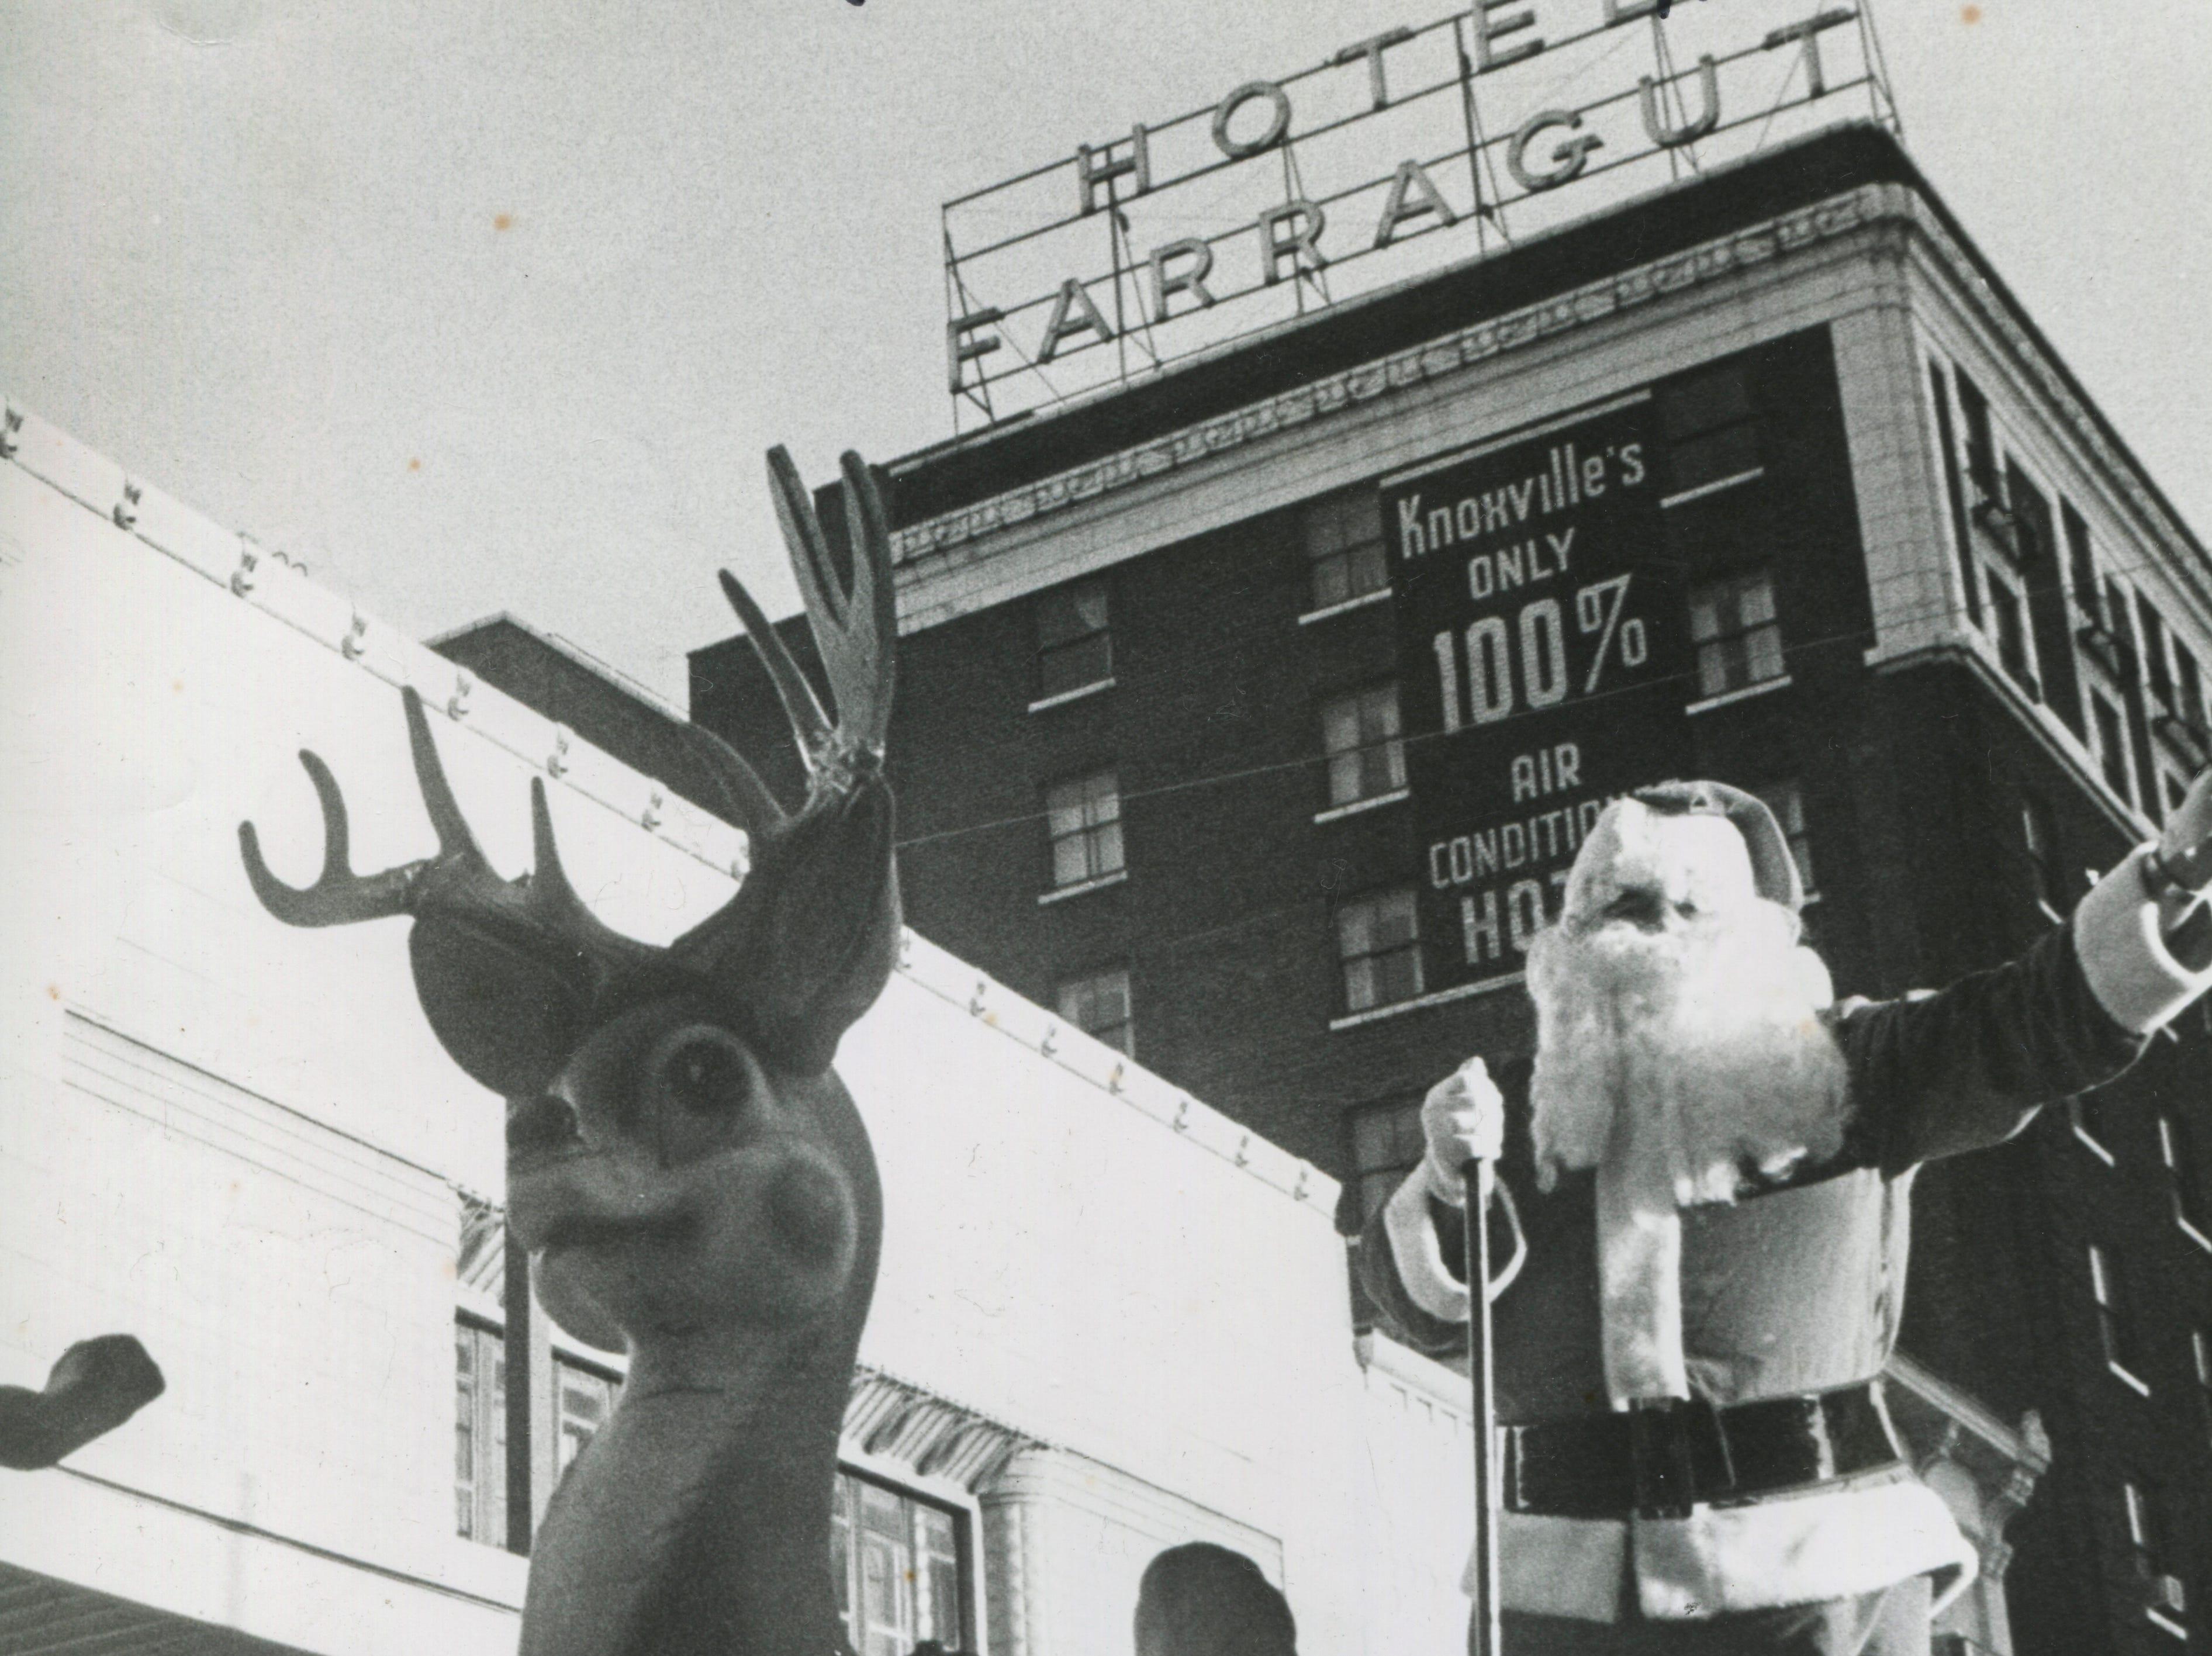 Santa waves during the Christmas parade on Saturday, Dec. 18, 1976, on Gay Street.